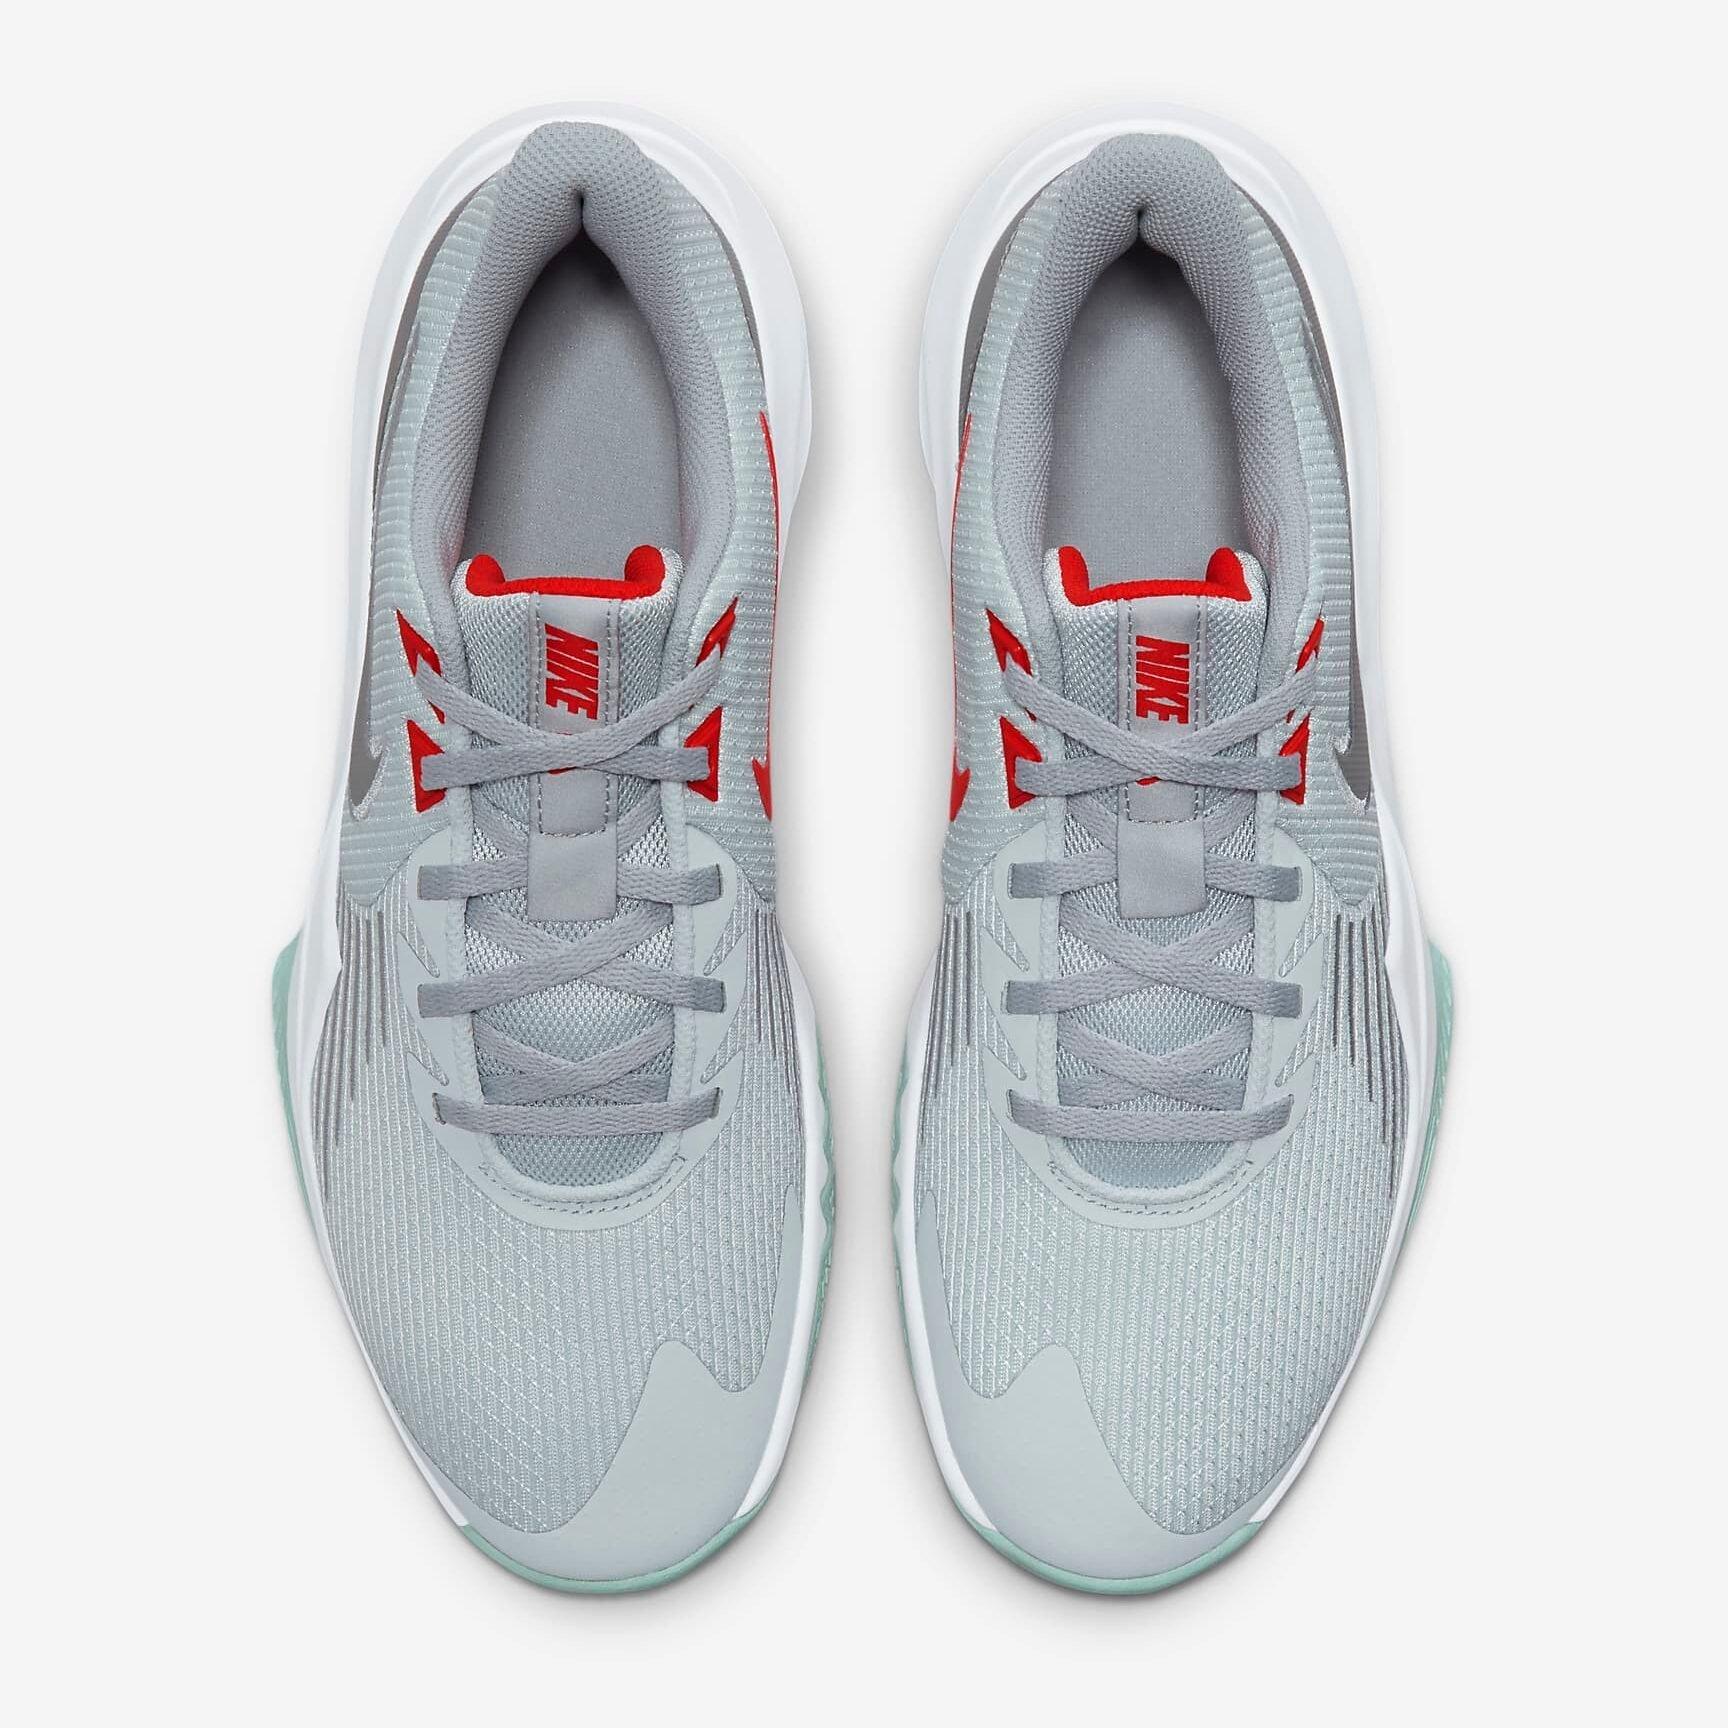 Nike Precision 5 Review: Top